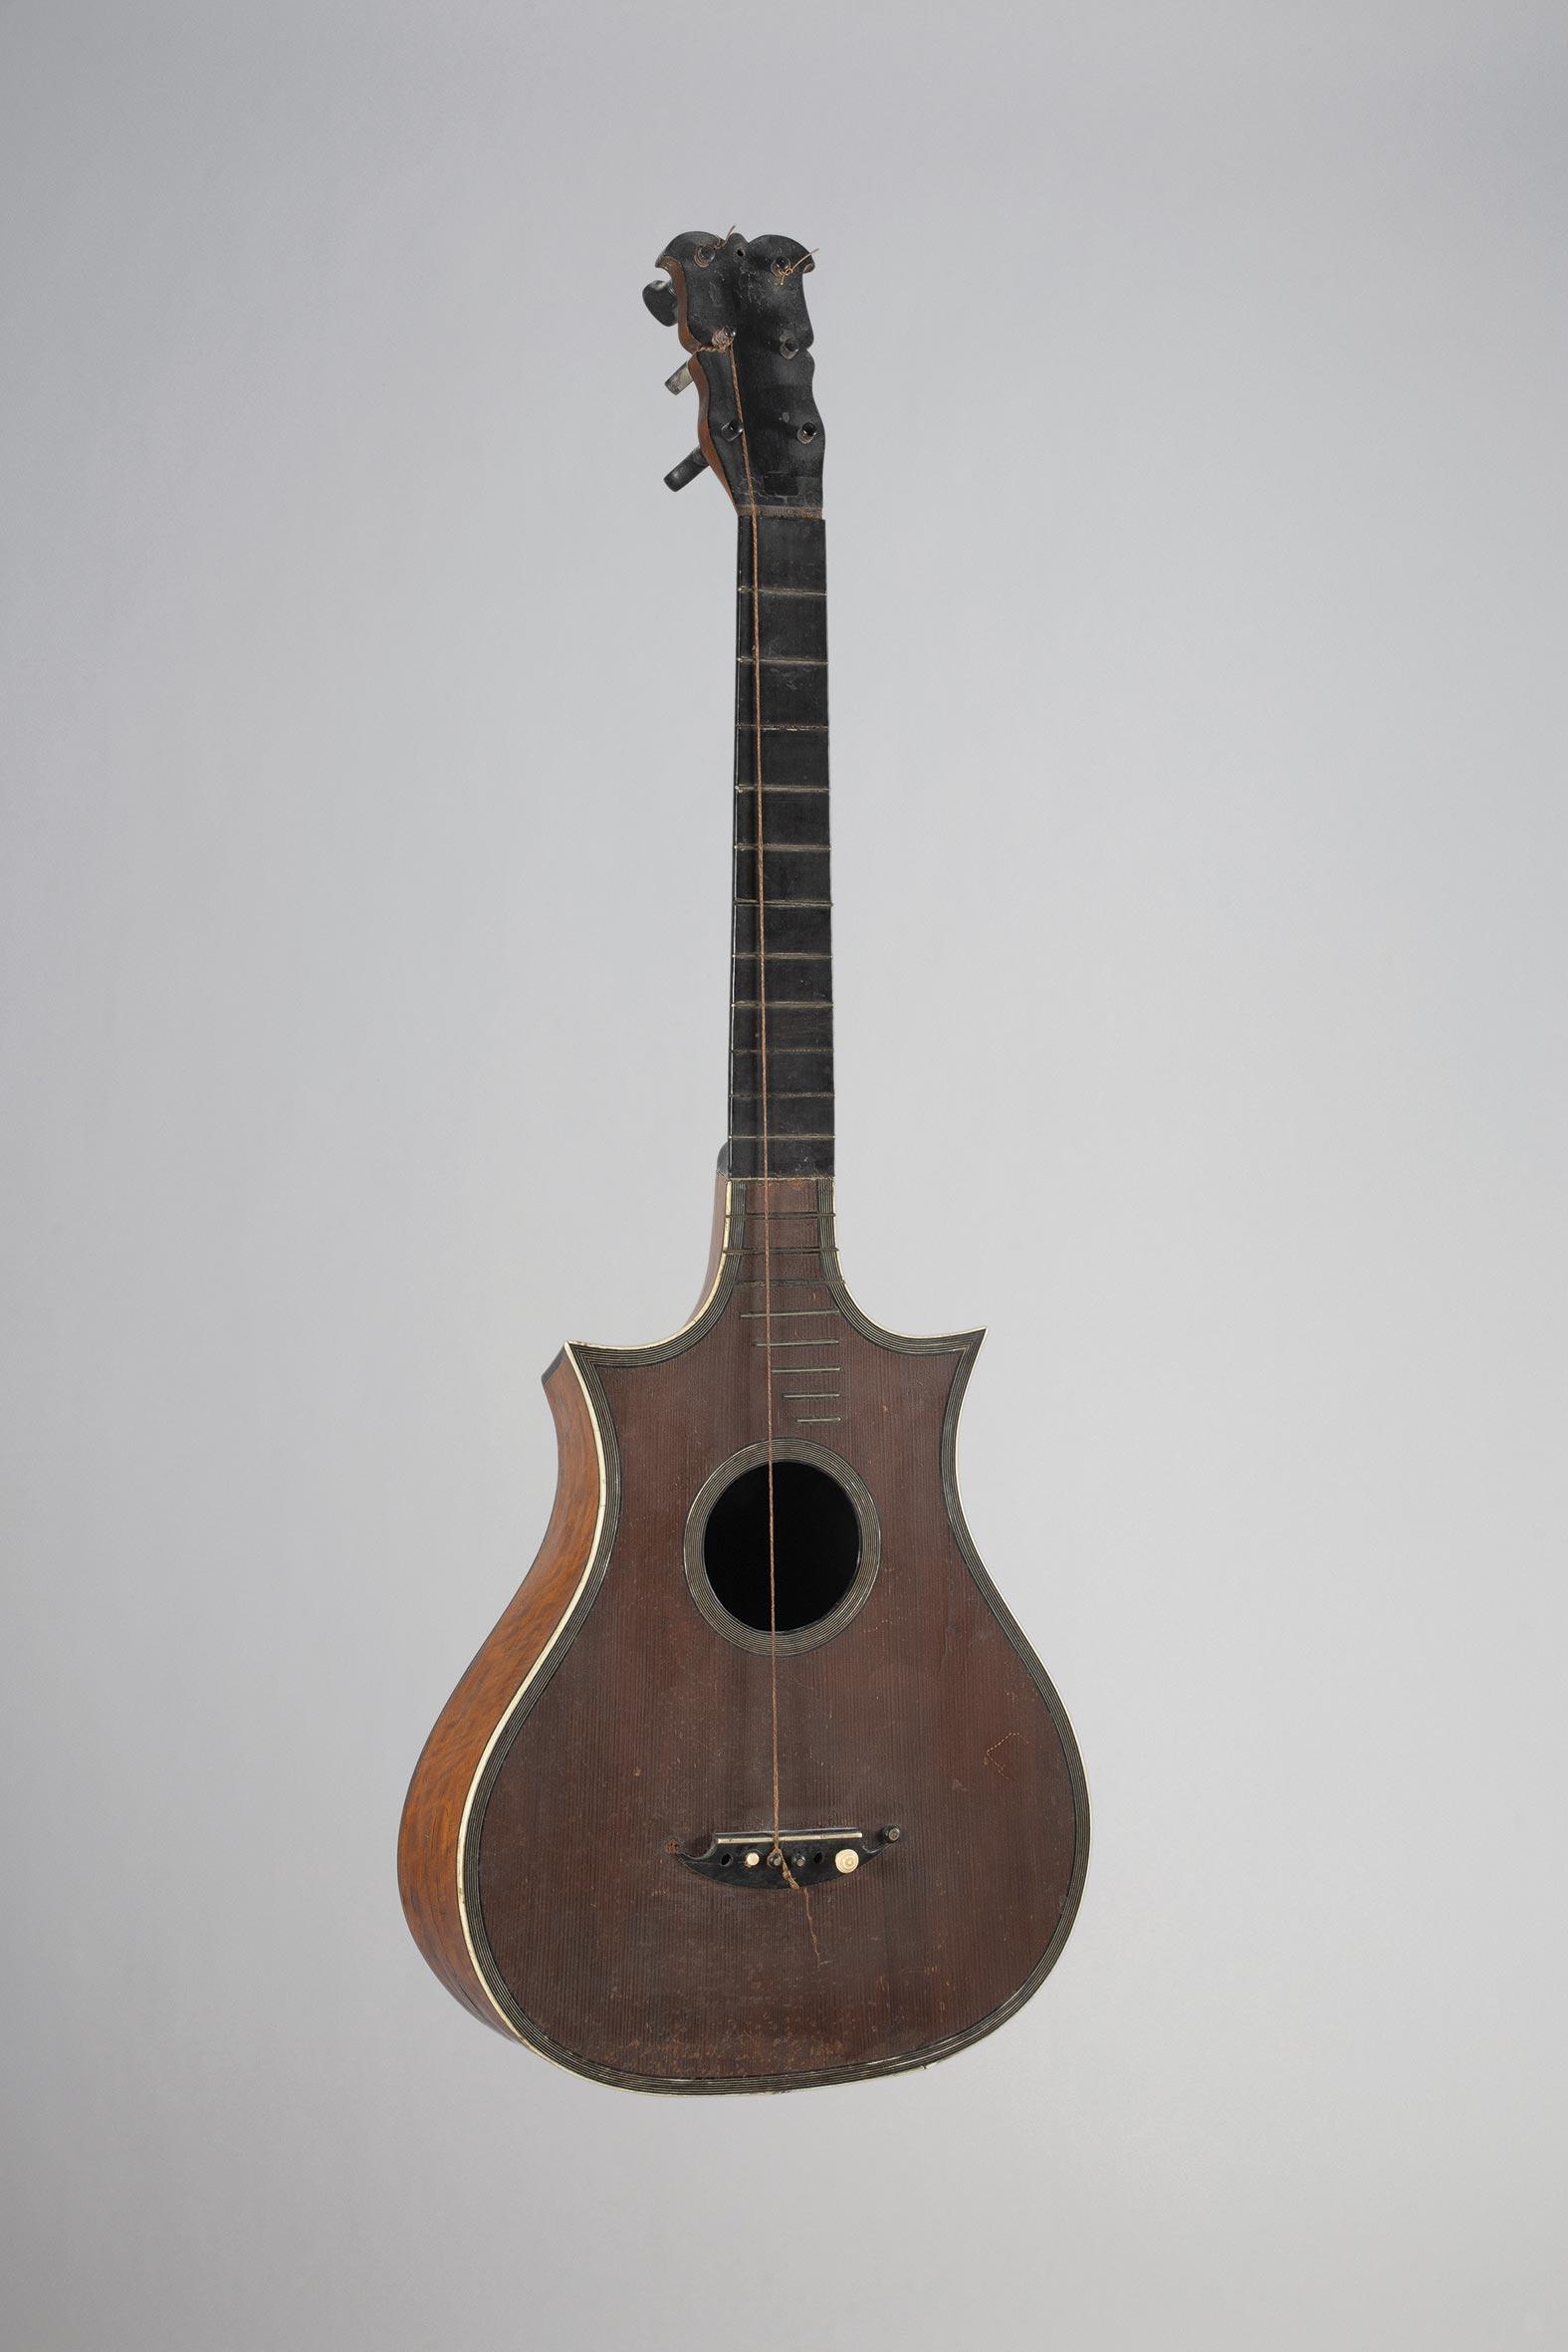 Guitare romantique de Nicolas VISSENAIRE